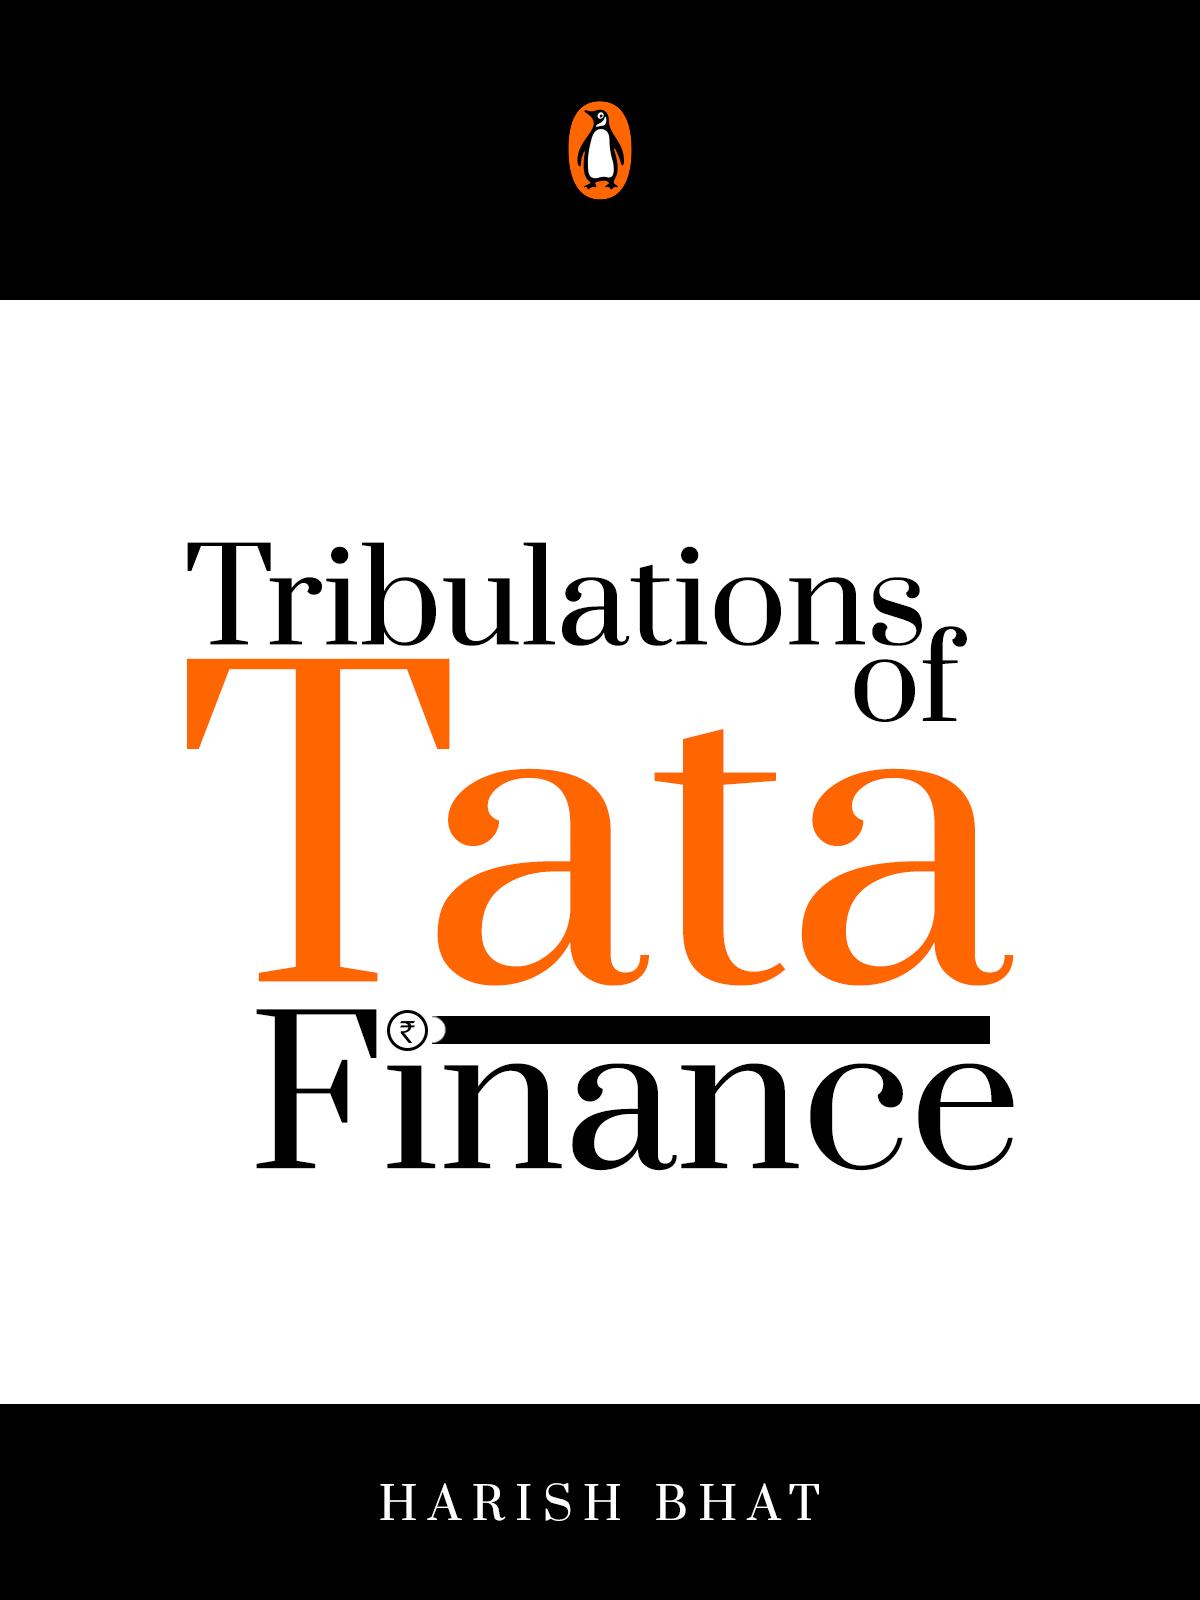 The Tribulations of Tata Finance